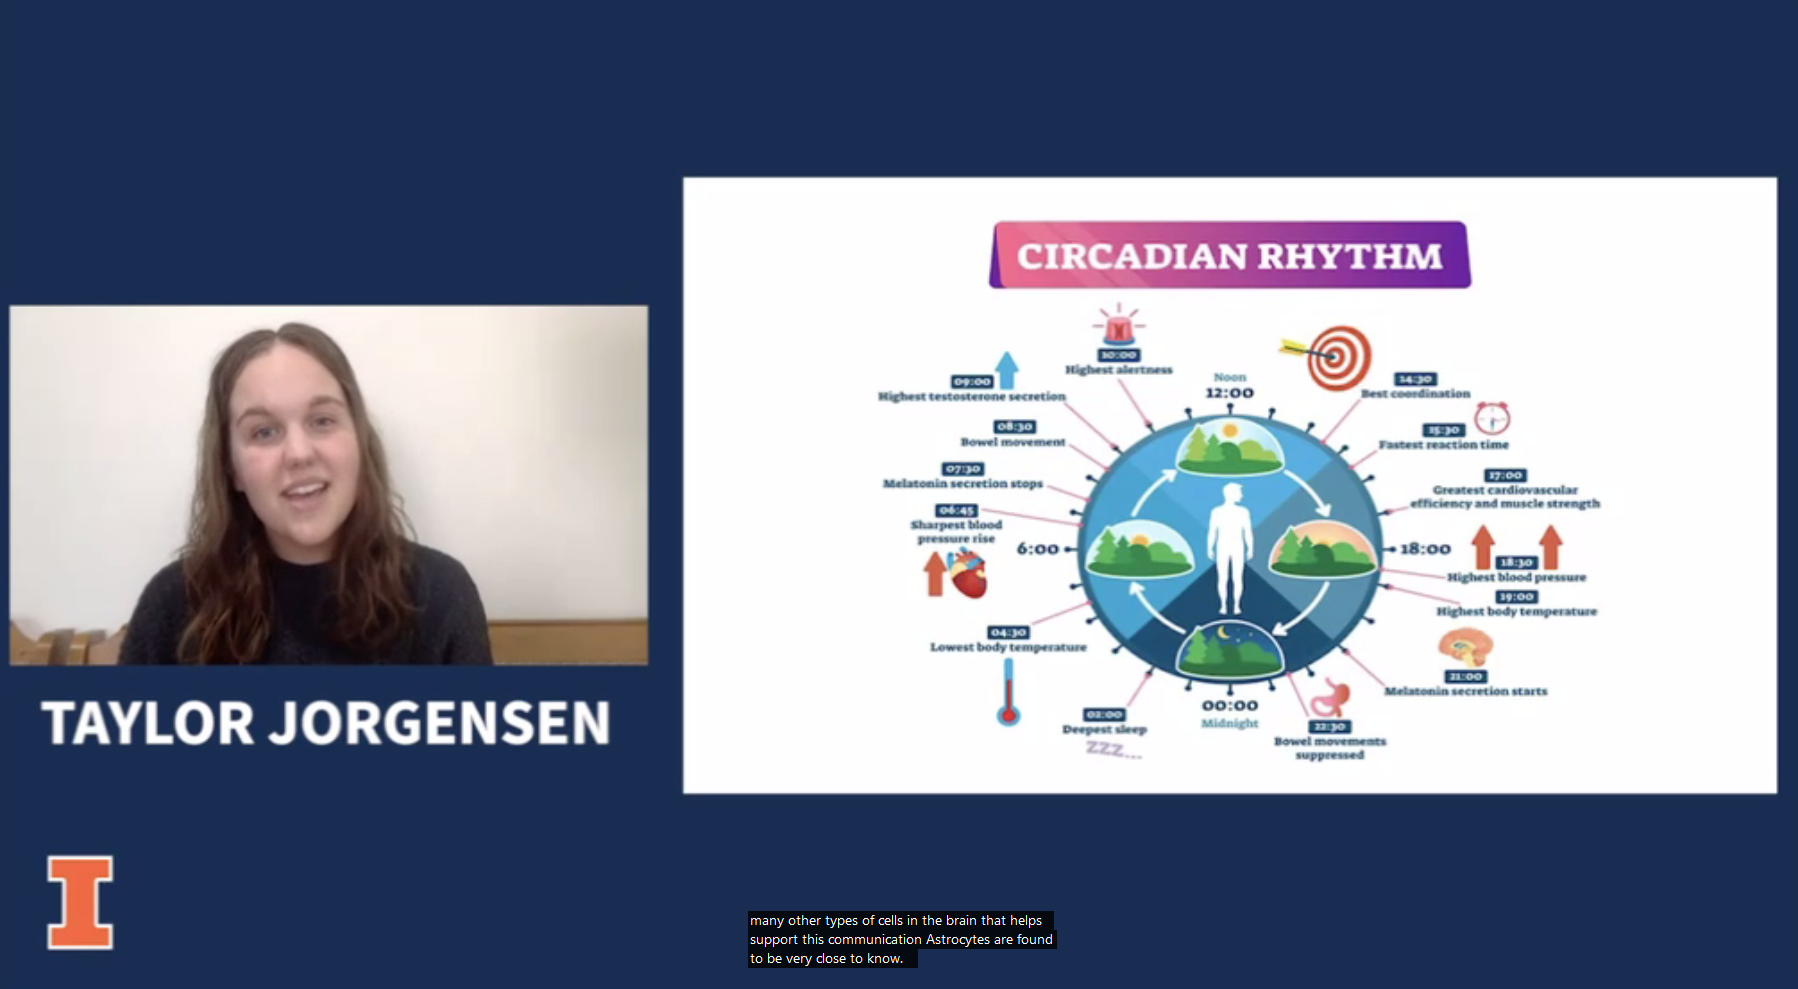 Taylor Jorgensen's video research presentation